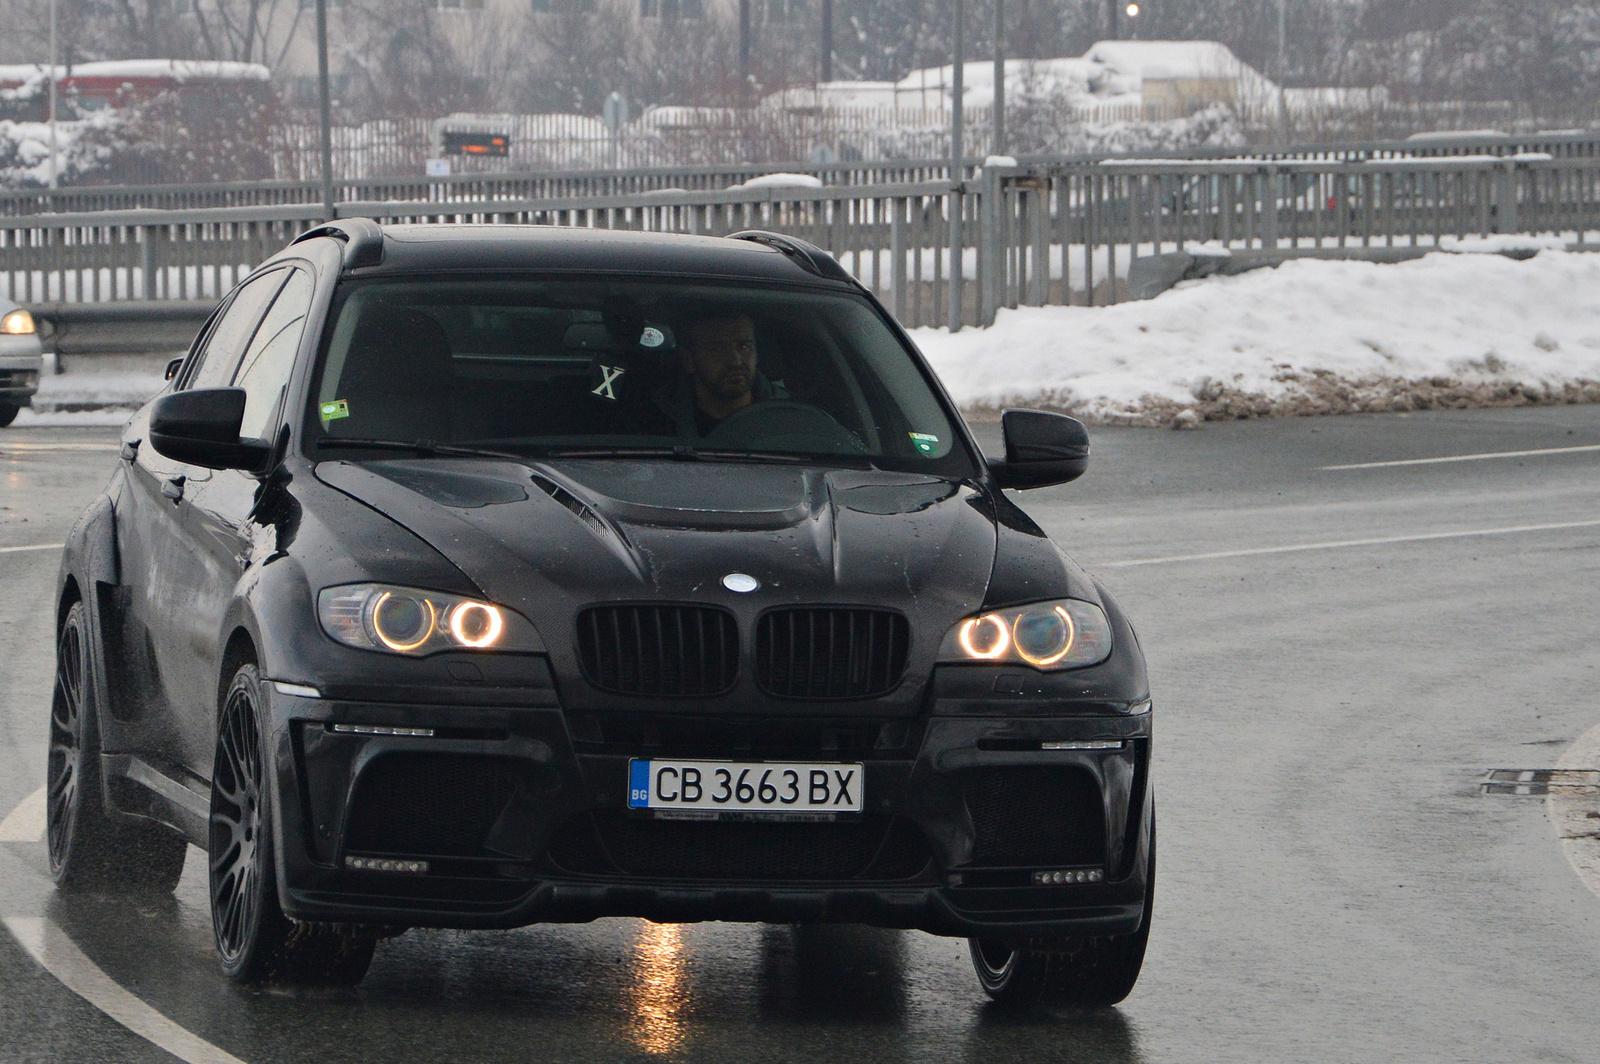 BMW X6 Hamann Tycoon Evo